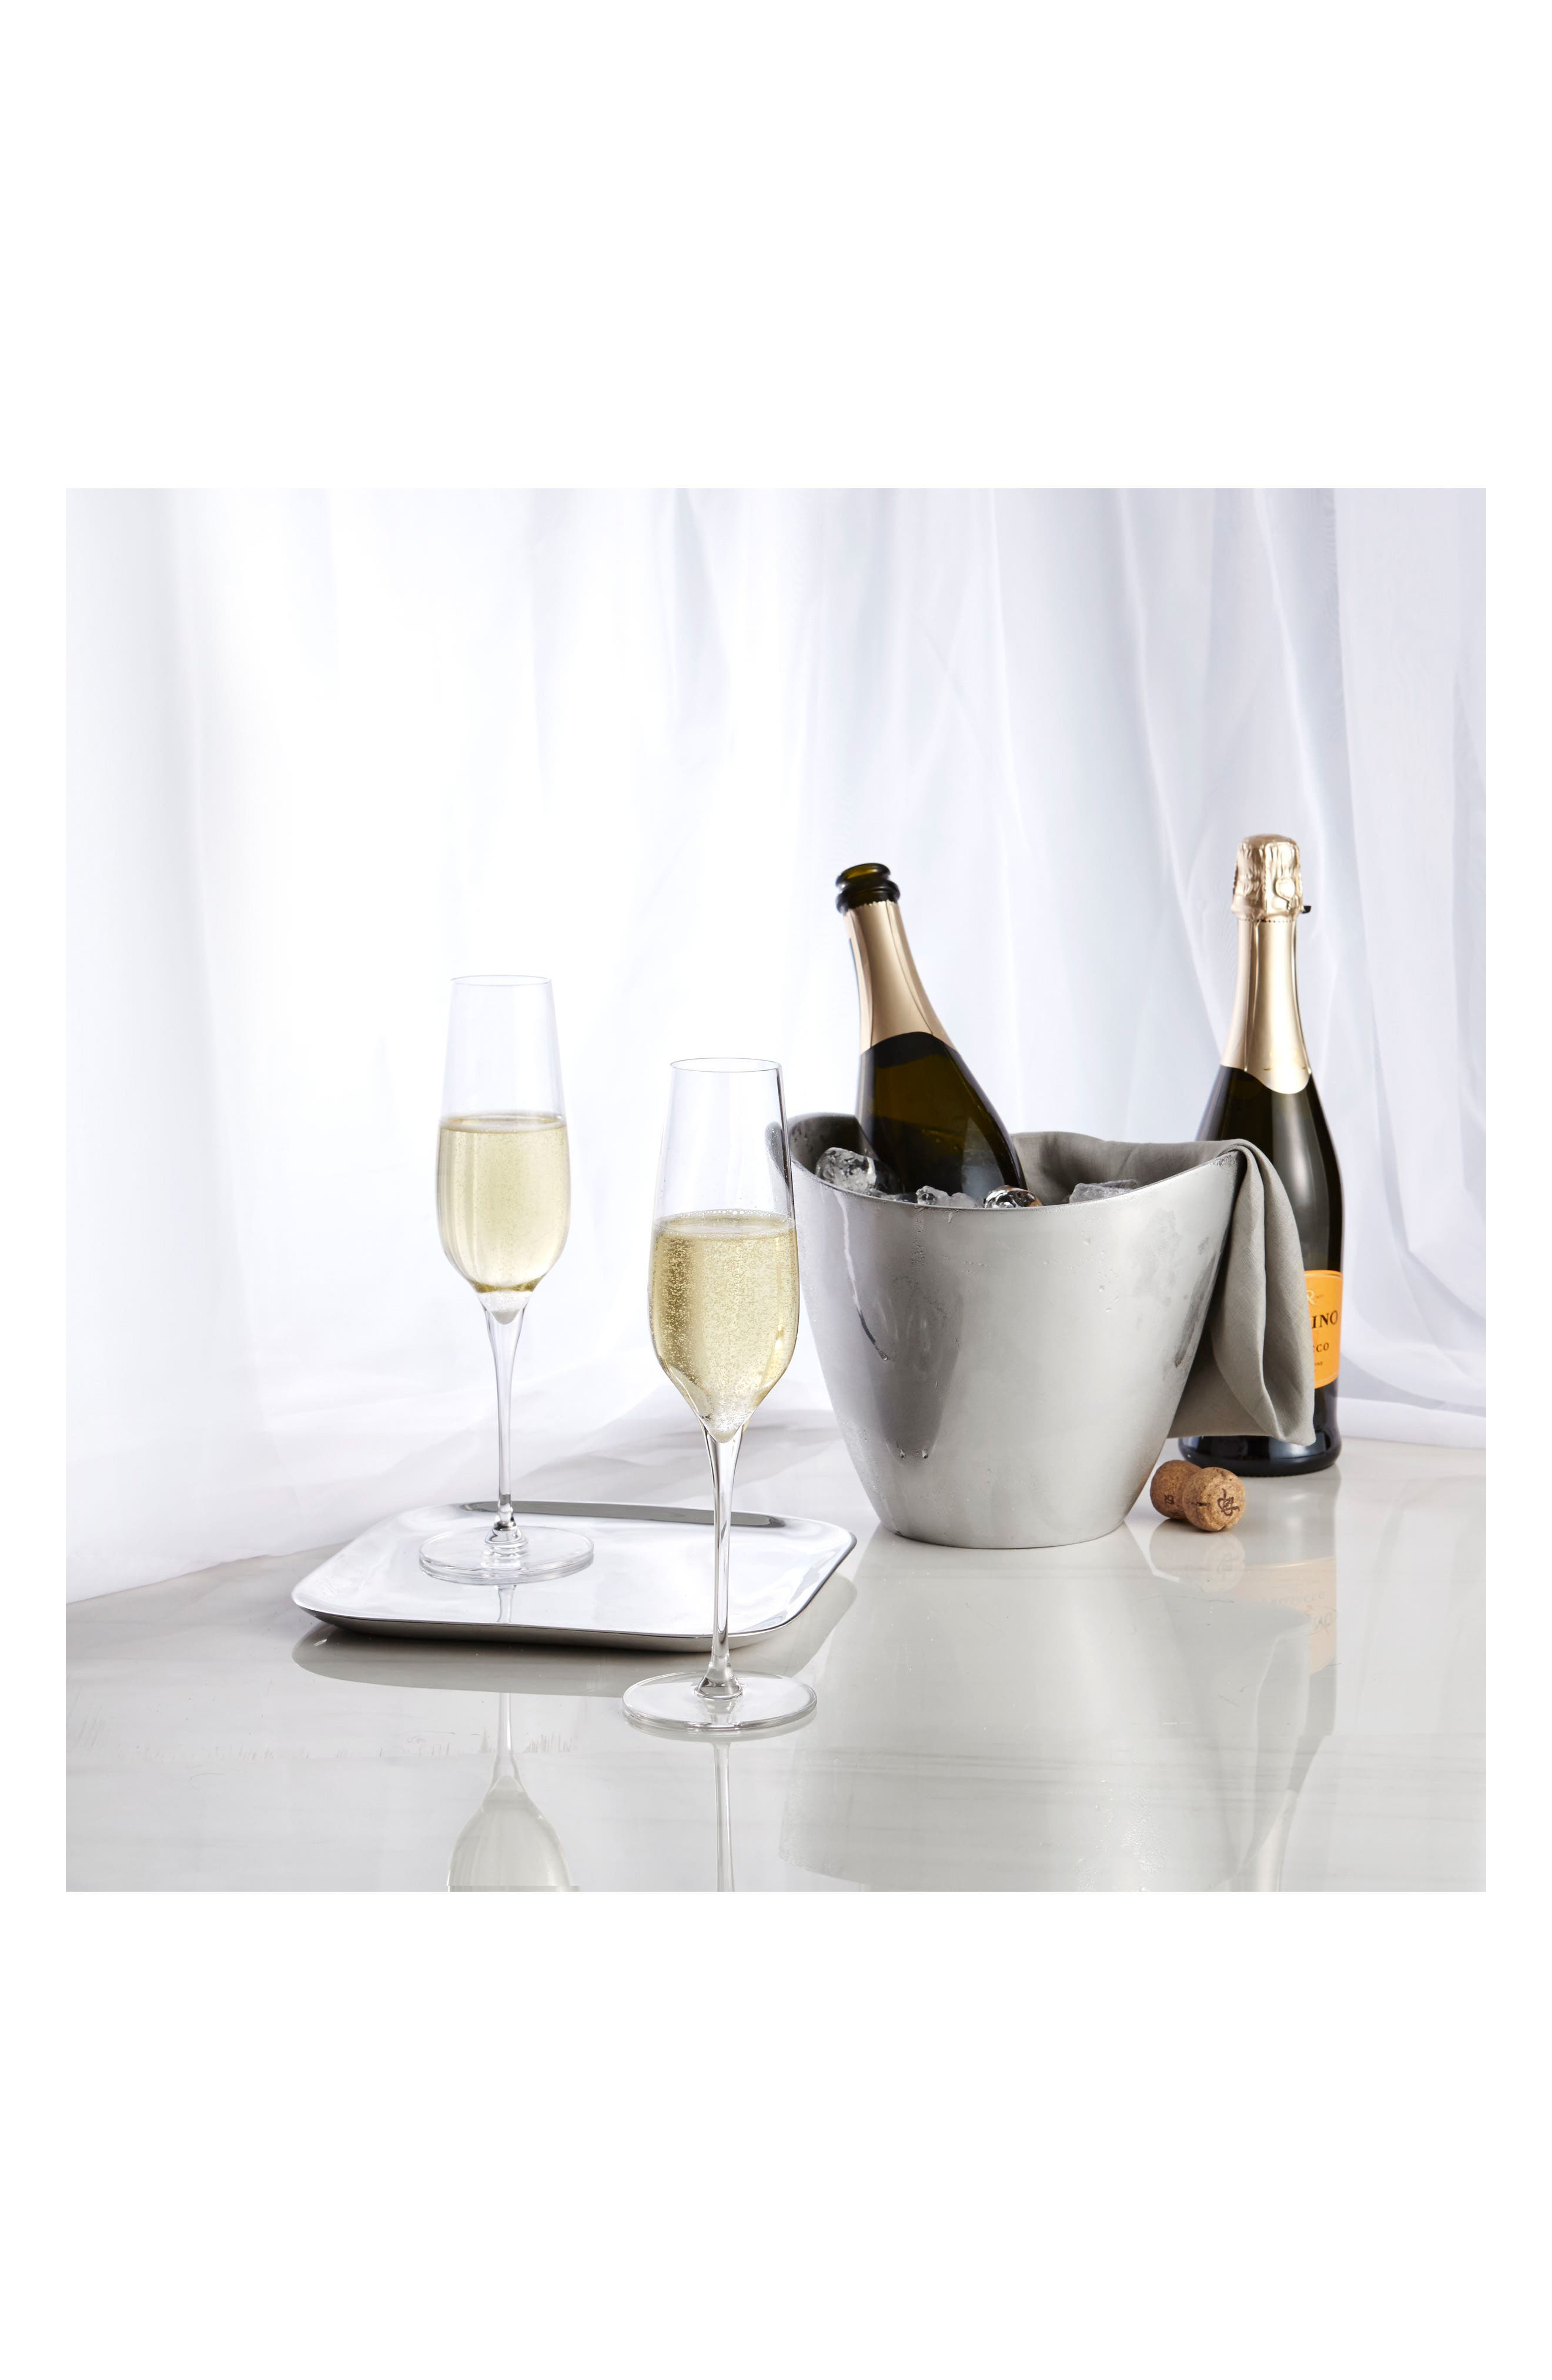 Vie Set of 2 Champagne Flutes,                             Alternate thumbnail 2, color,                             Clear